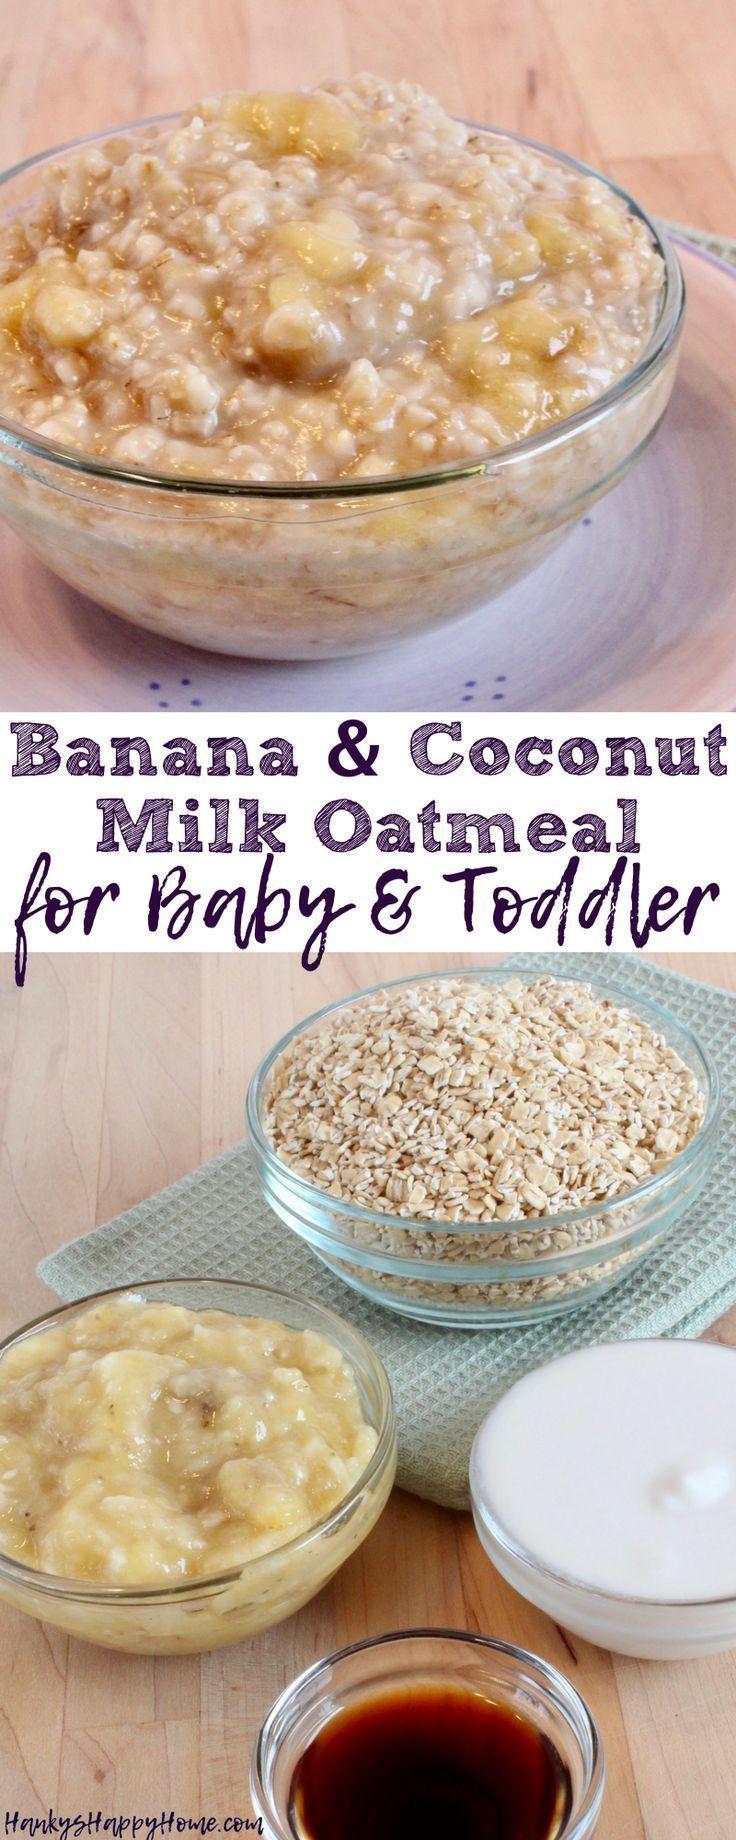 This Banana & Coconut Milk Oatmeal combines wholesome oatmeal, sweet bananas, an…